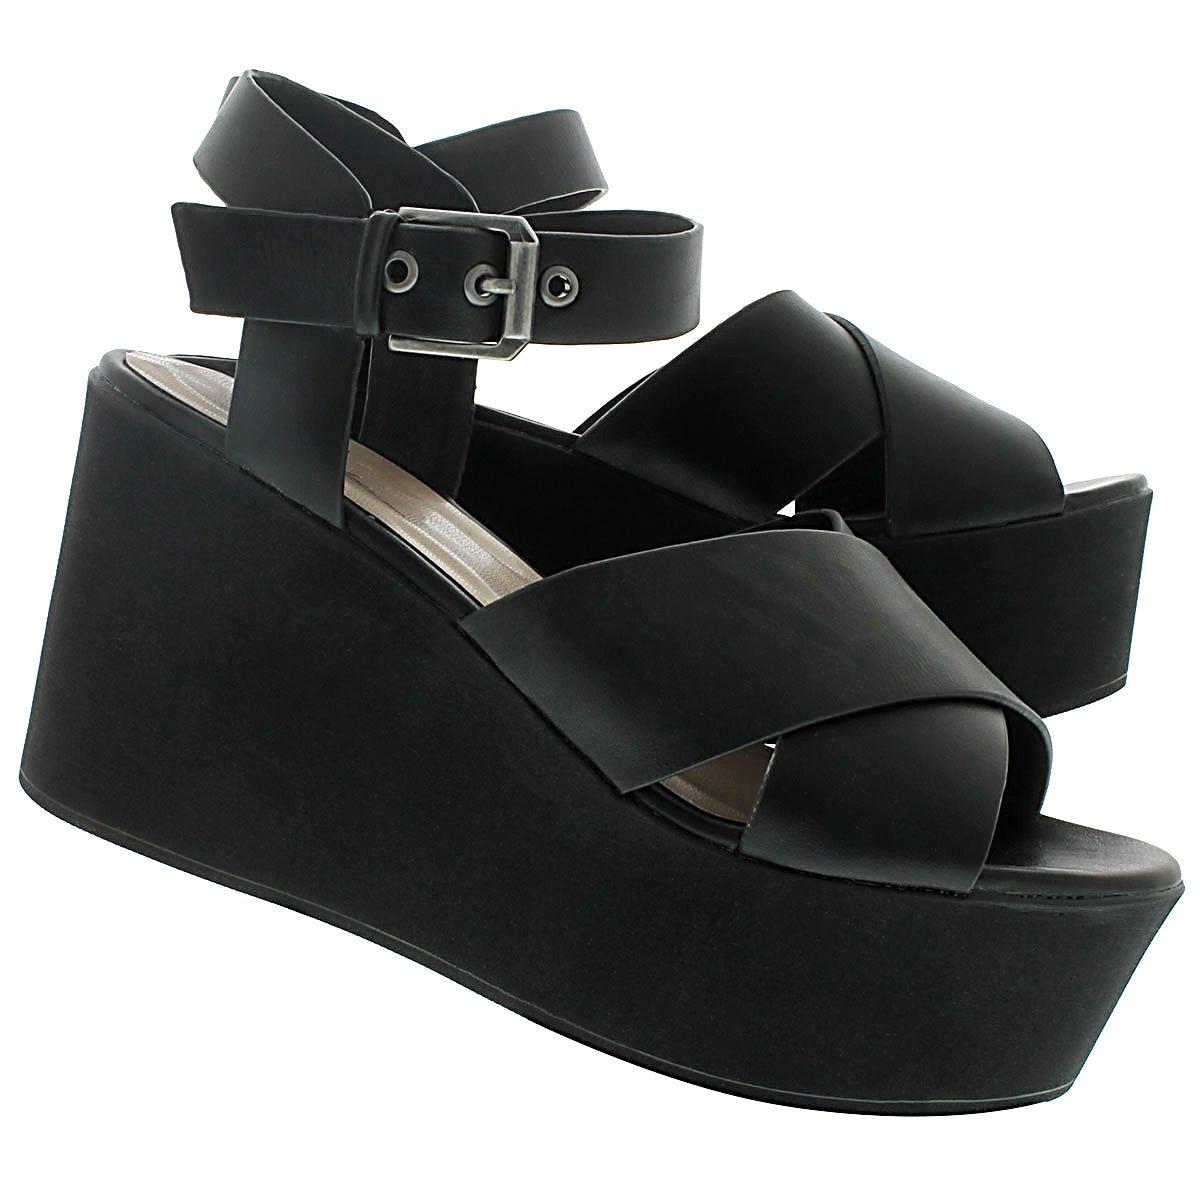 Lds Nikki black platform wedge sandal